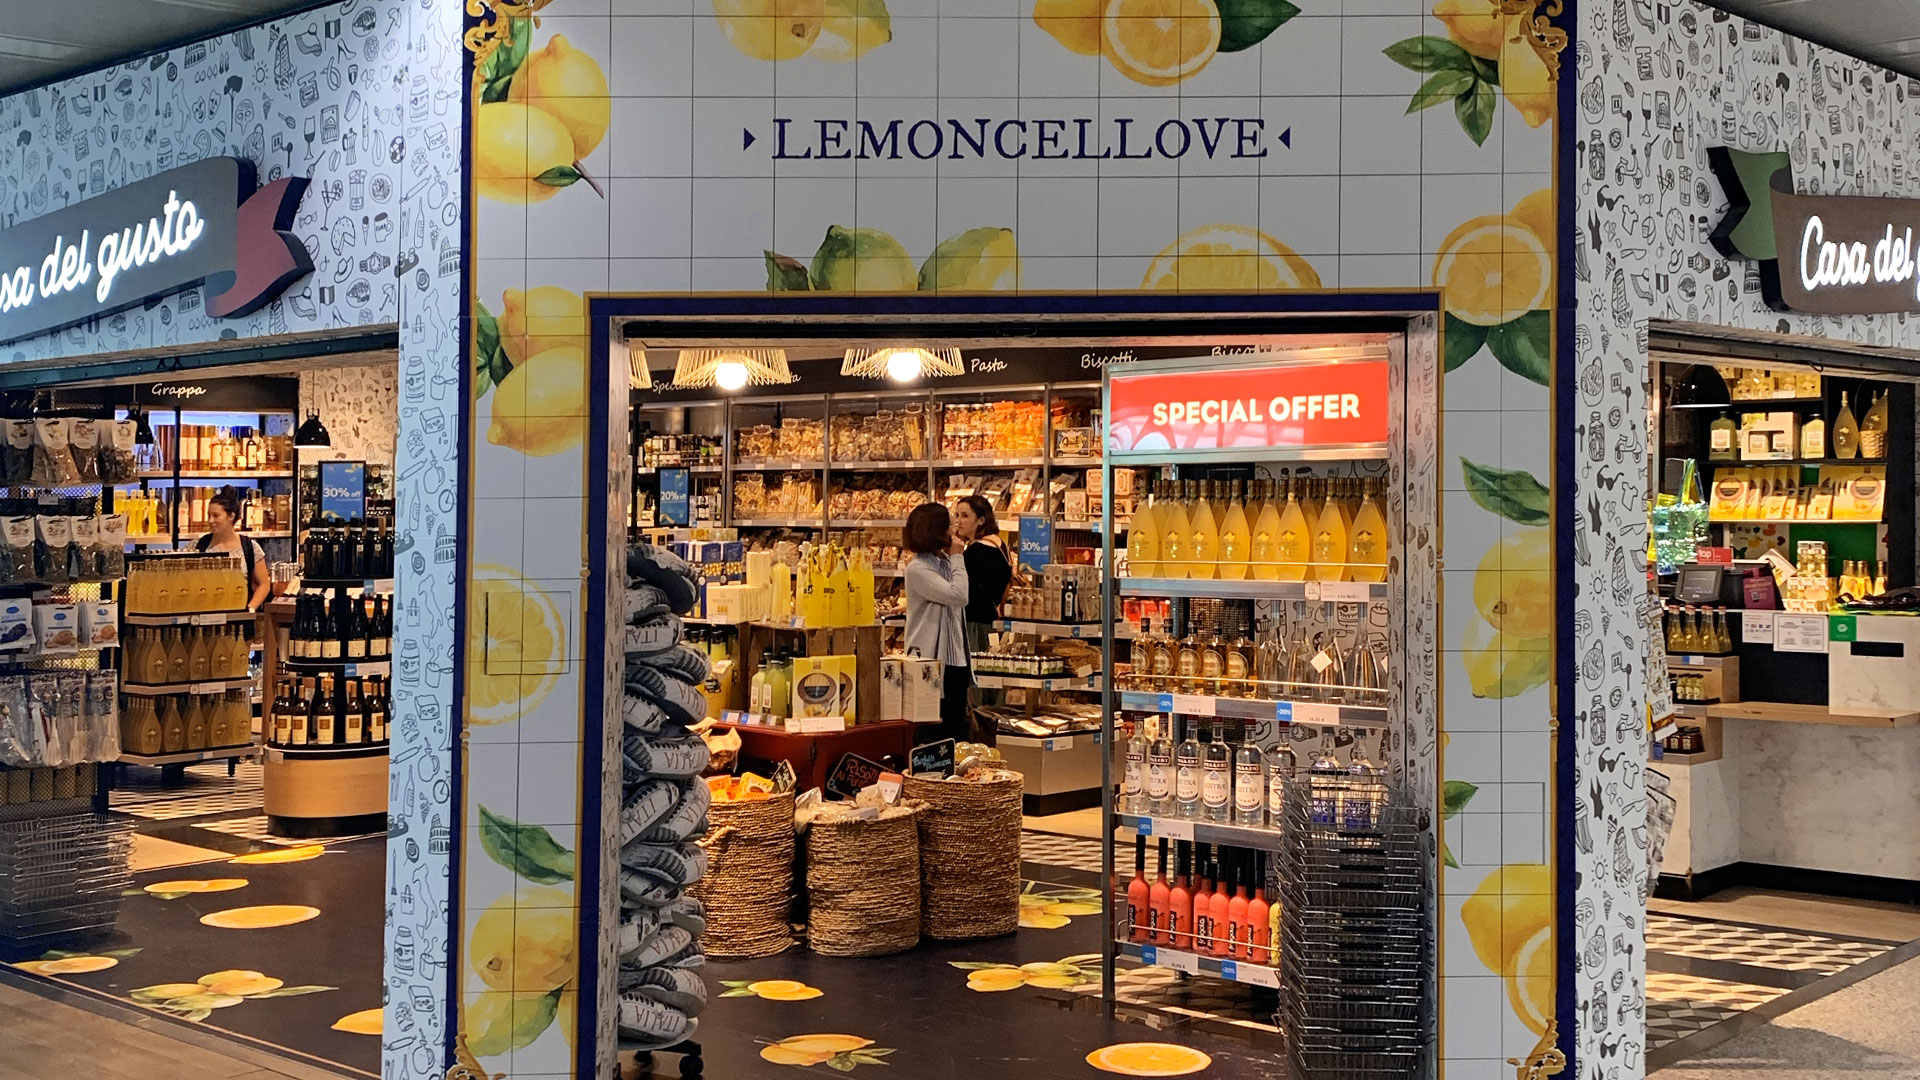 Lemoncellove 3